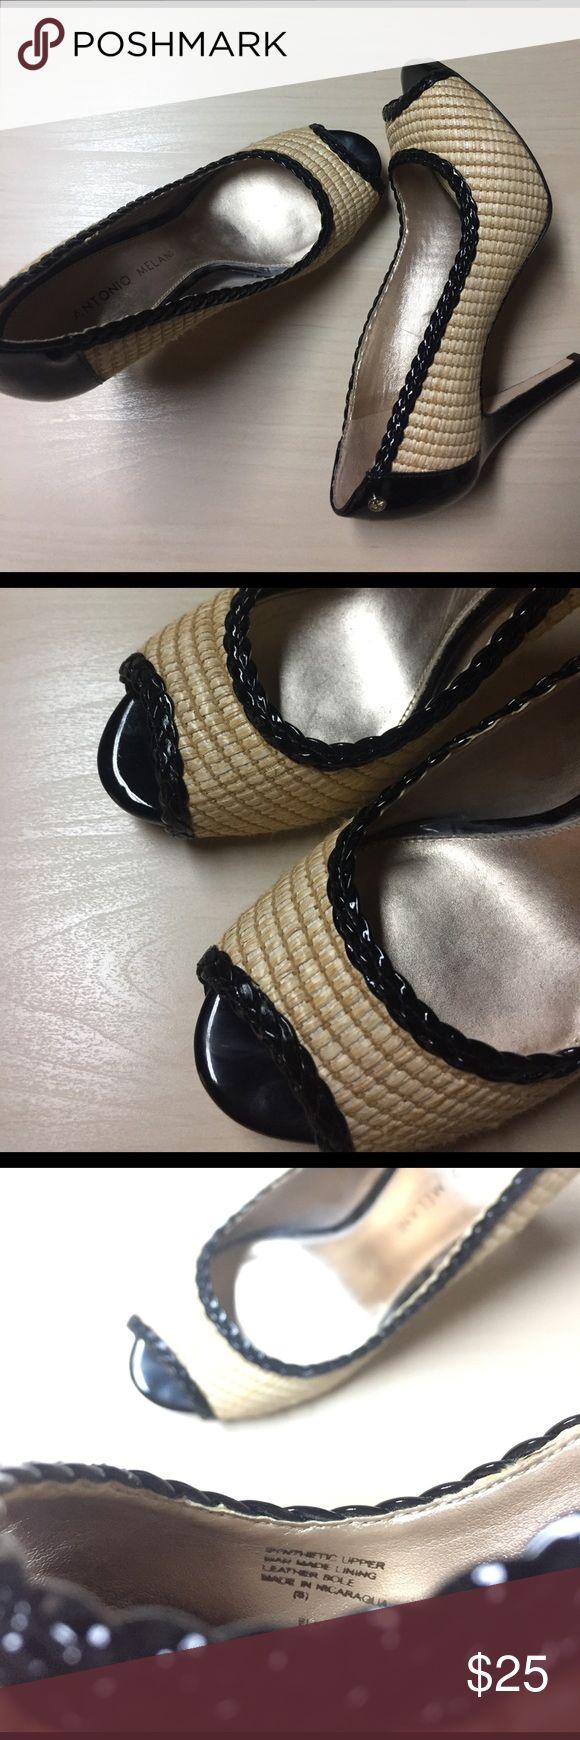 "Antonio Melani Patent Basketweave Braided Peeptoe Antonio Melani Patent Basketweave Braided Peeptoe // Super cute!  Approx 3.5"" Heel // excellent condition! Leather soles. ANTONIO MELANI Shoes Heels"